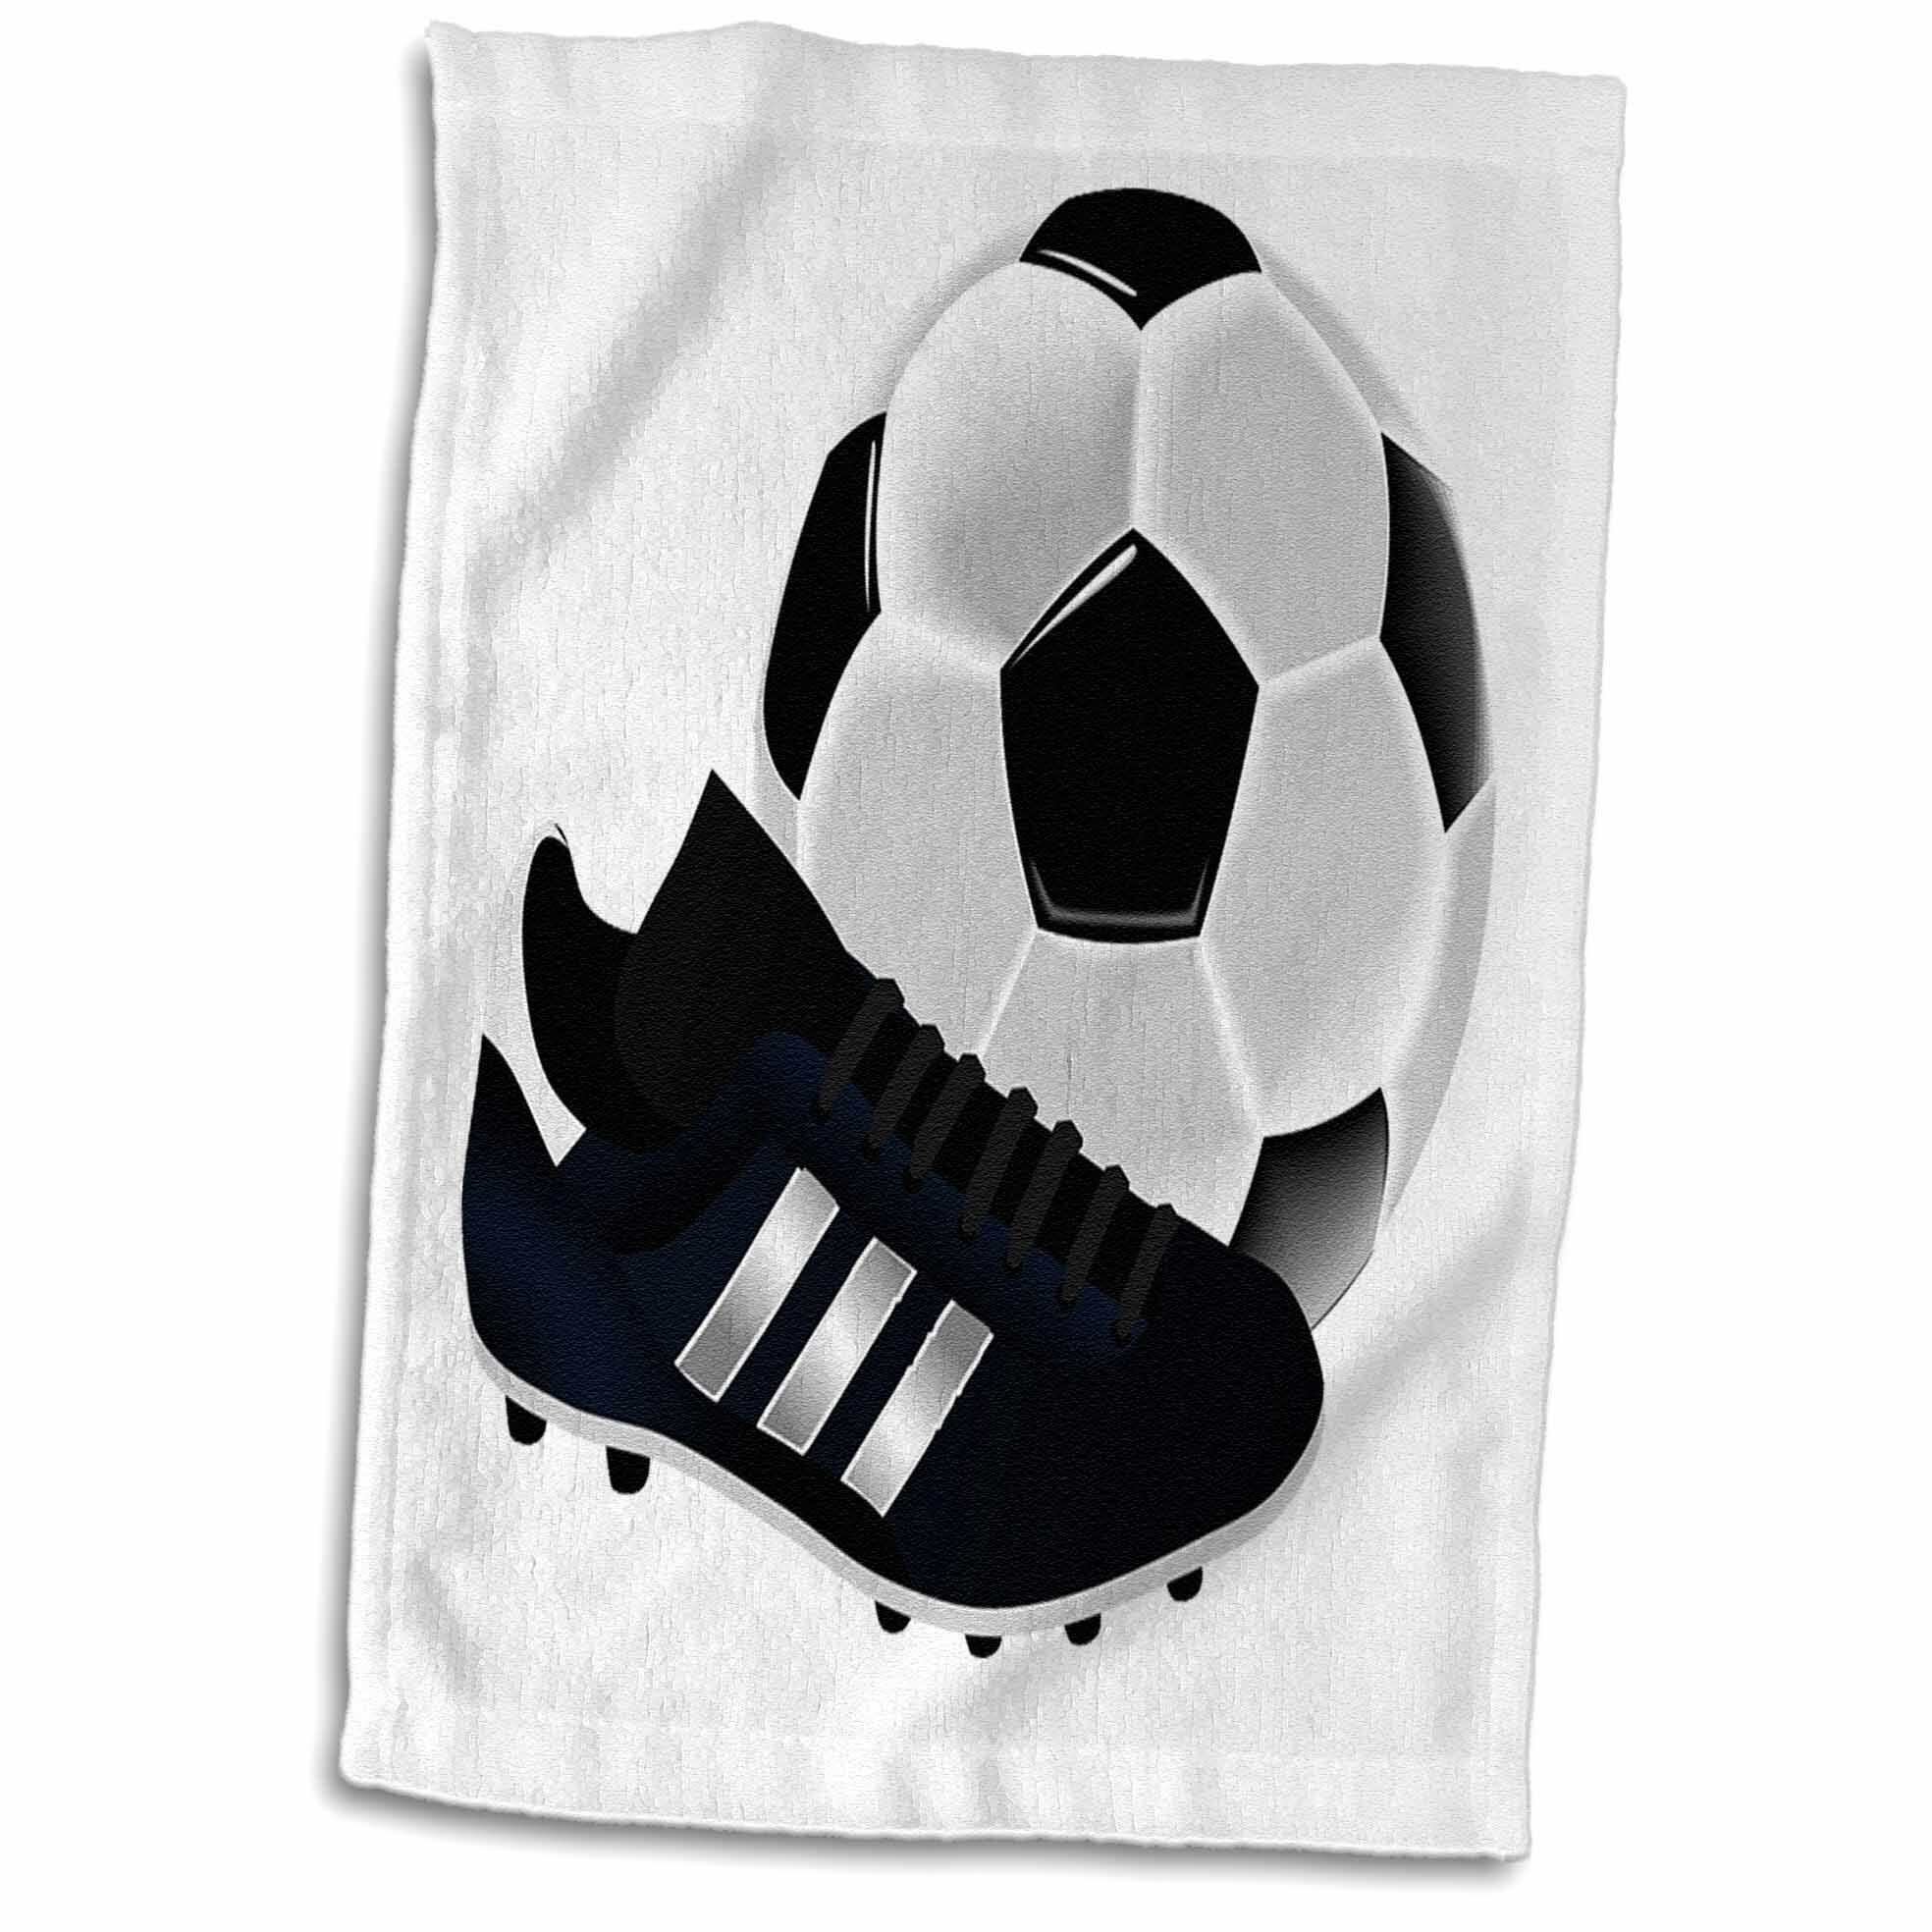 East Urban Home Jack Image Of Soccer Ball And Shoe Close Up Tea Towel Wayfair